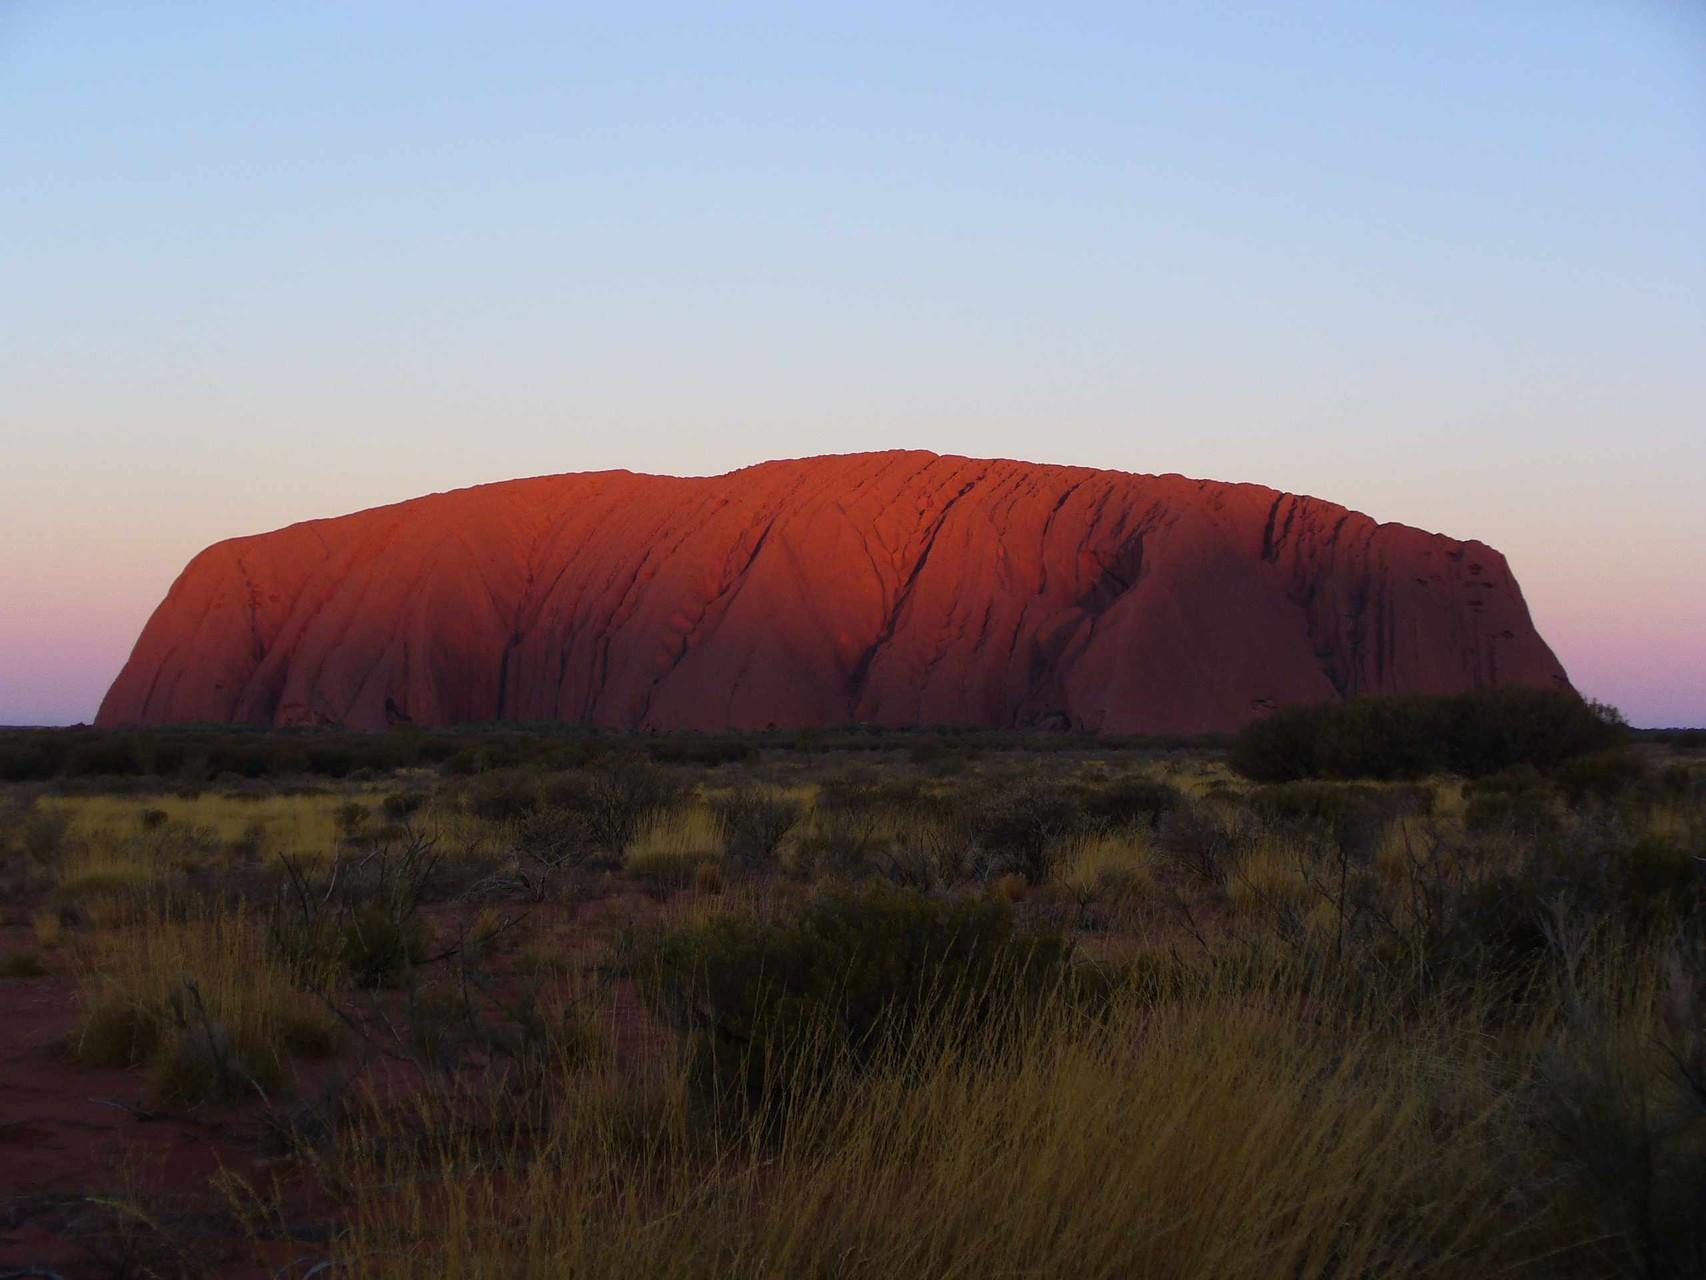 Sonnenuntergang am Uluru (auch als Ayers Rock bekannt), Northern Territory